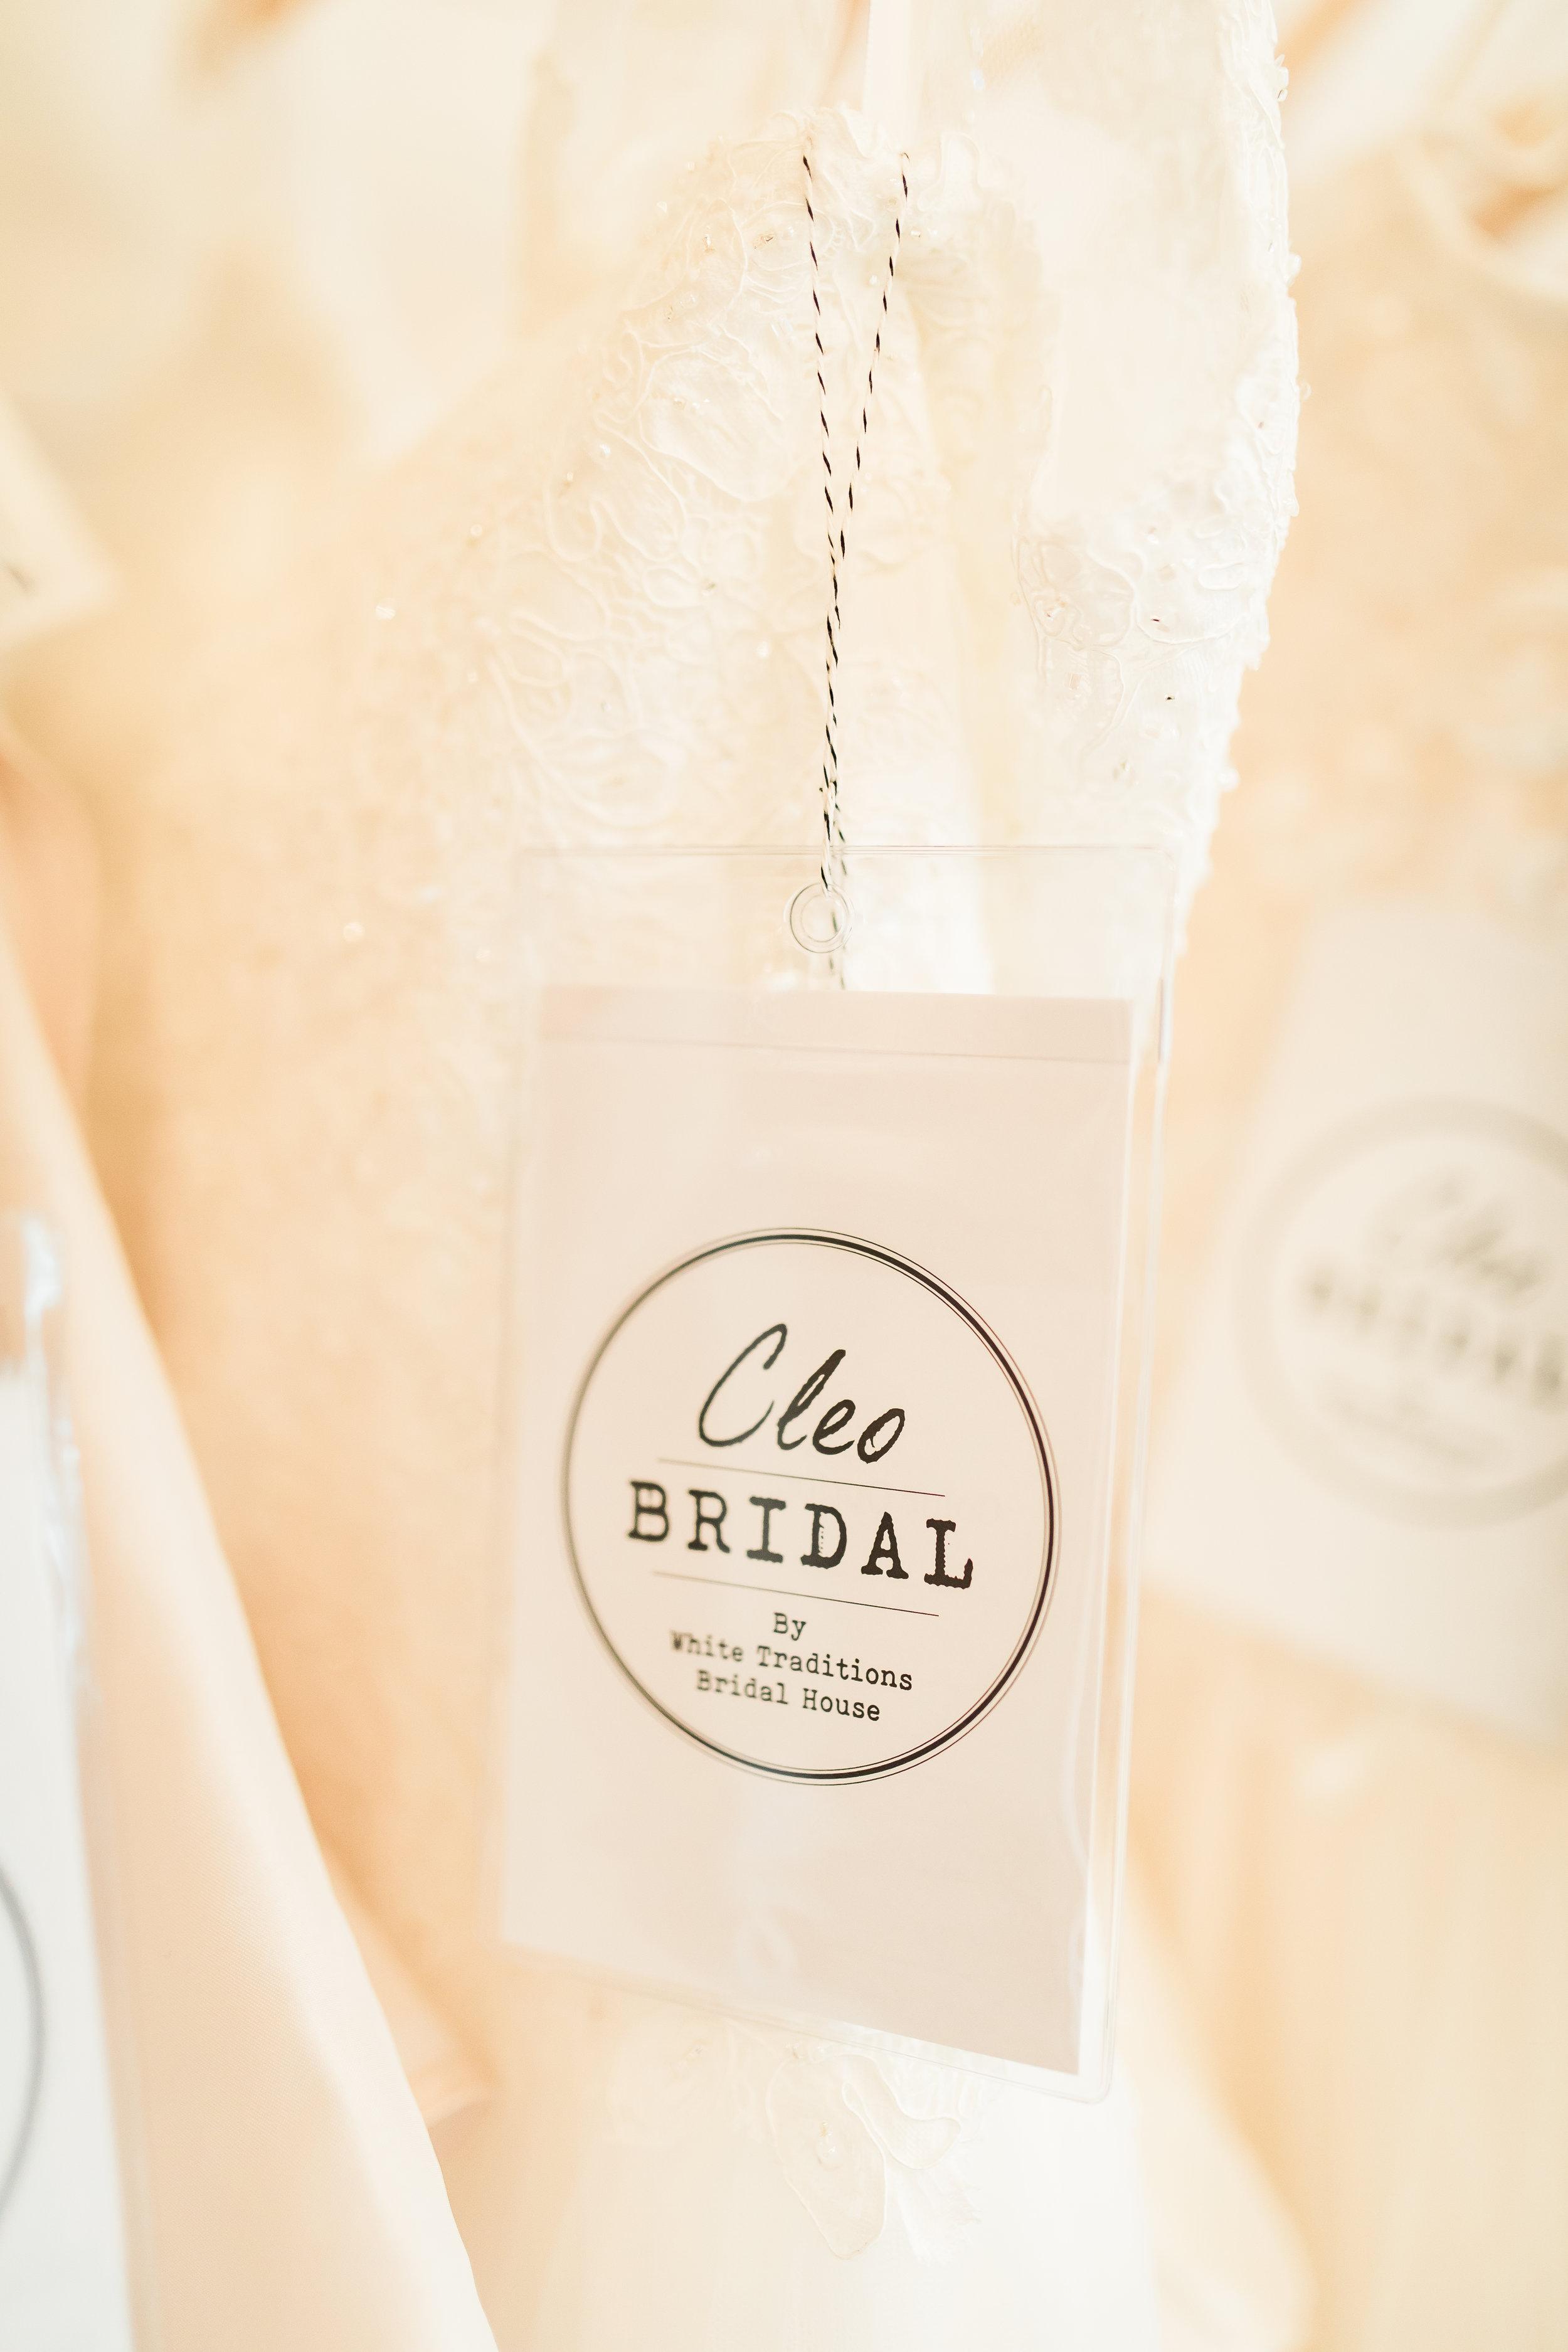 Cleo Bridal   White Traditions Sister-Store  O'Fallon, MO  Bridal Shop  Allison Slater Photography22.jpg